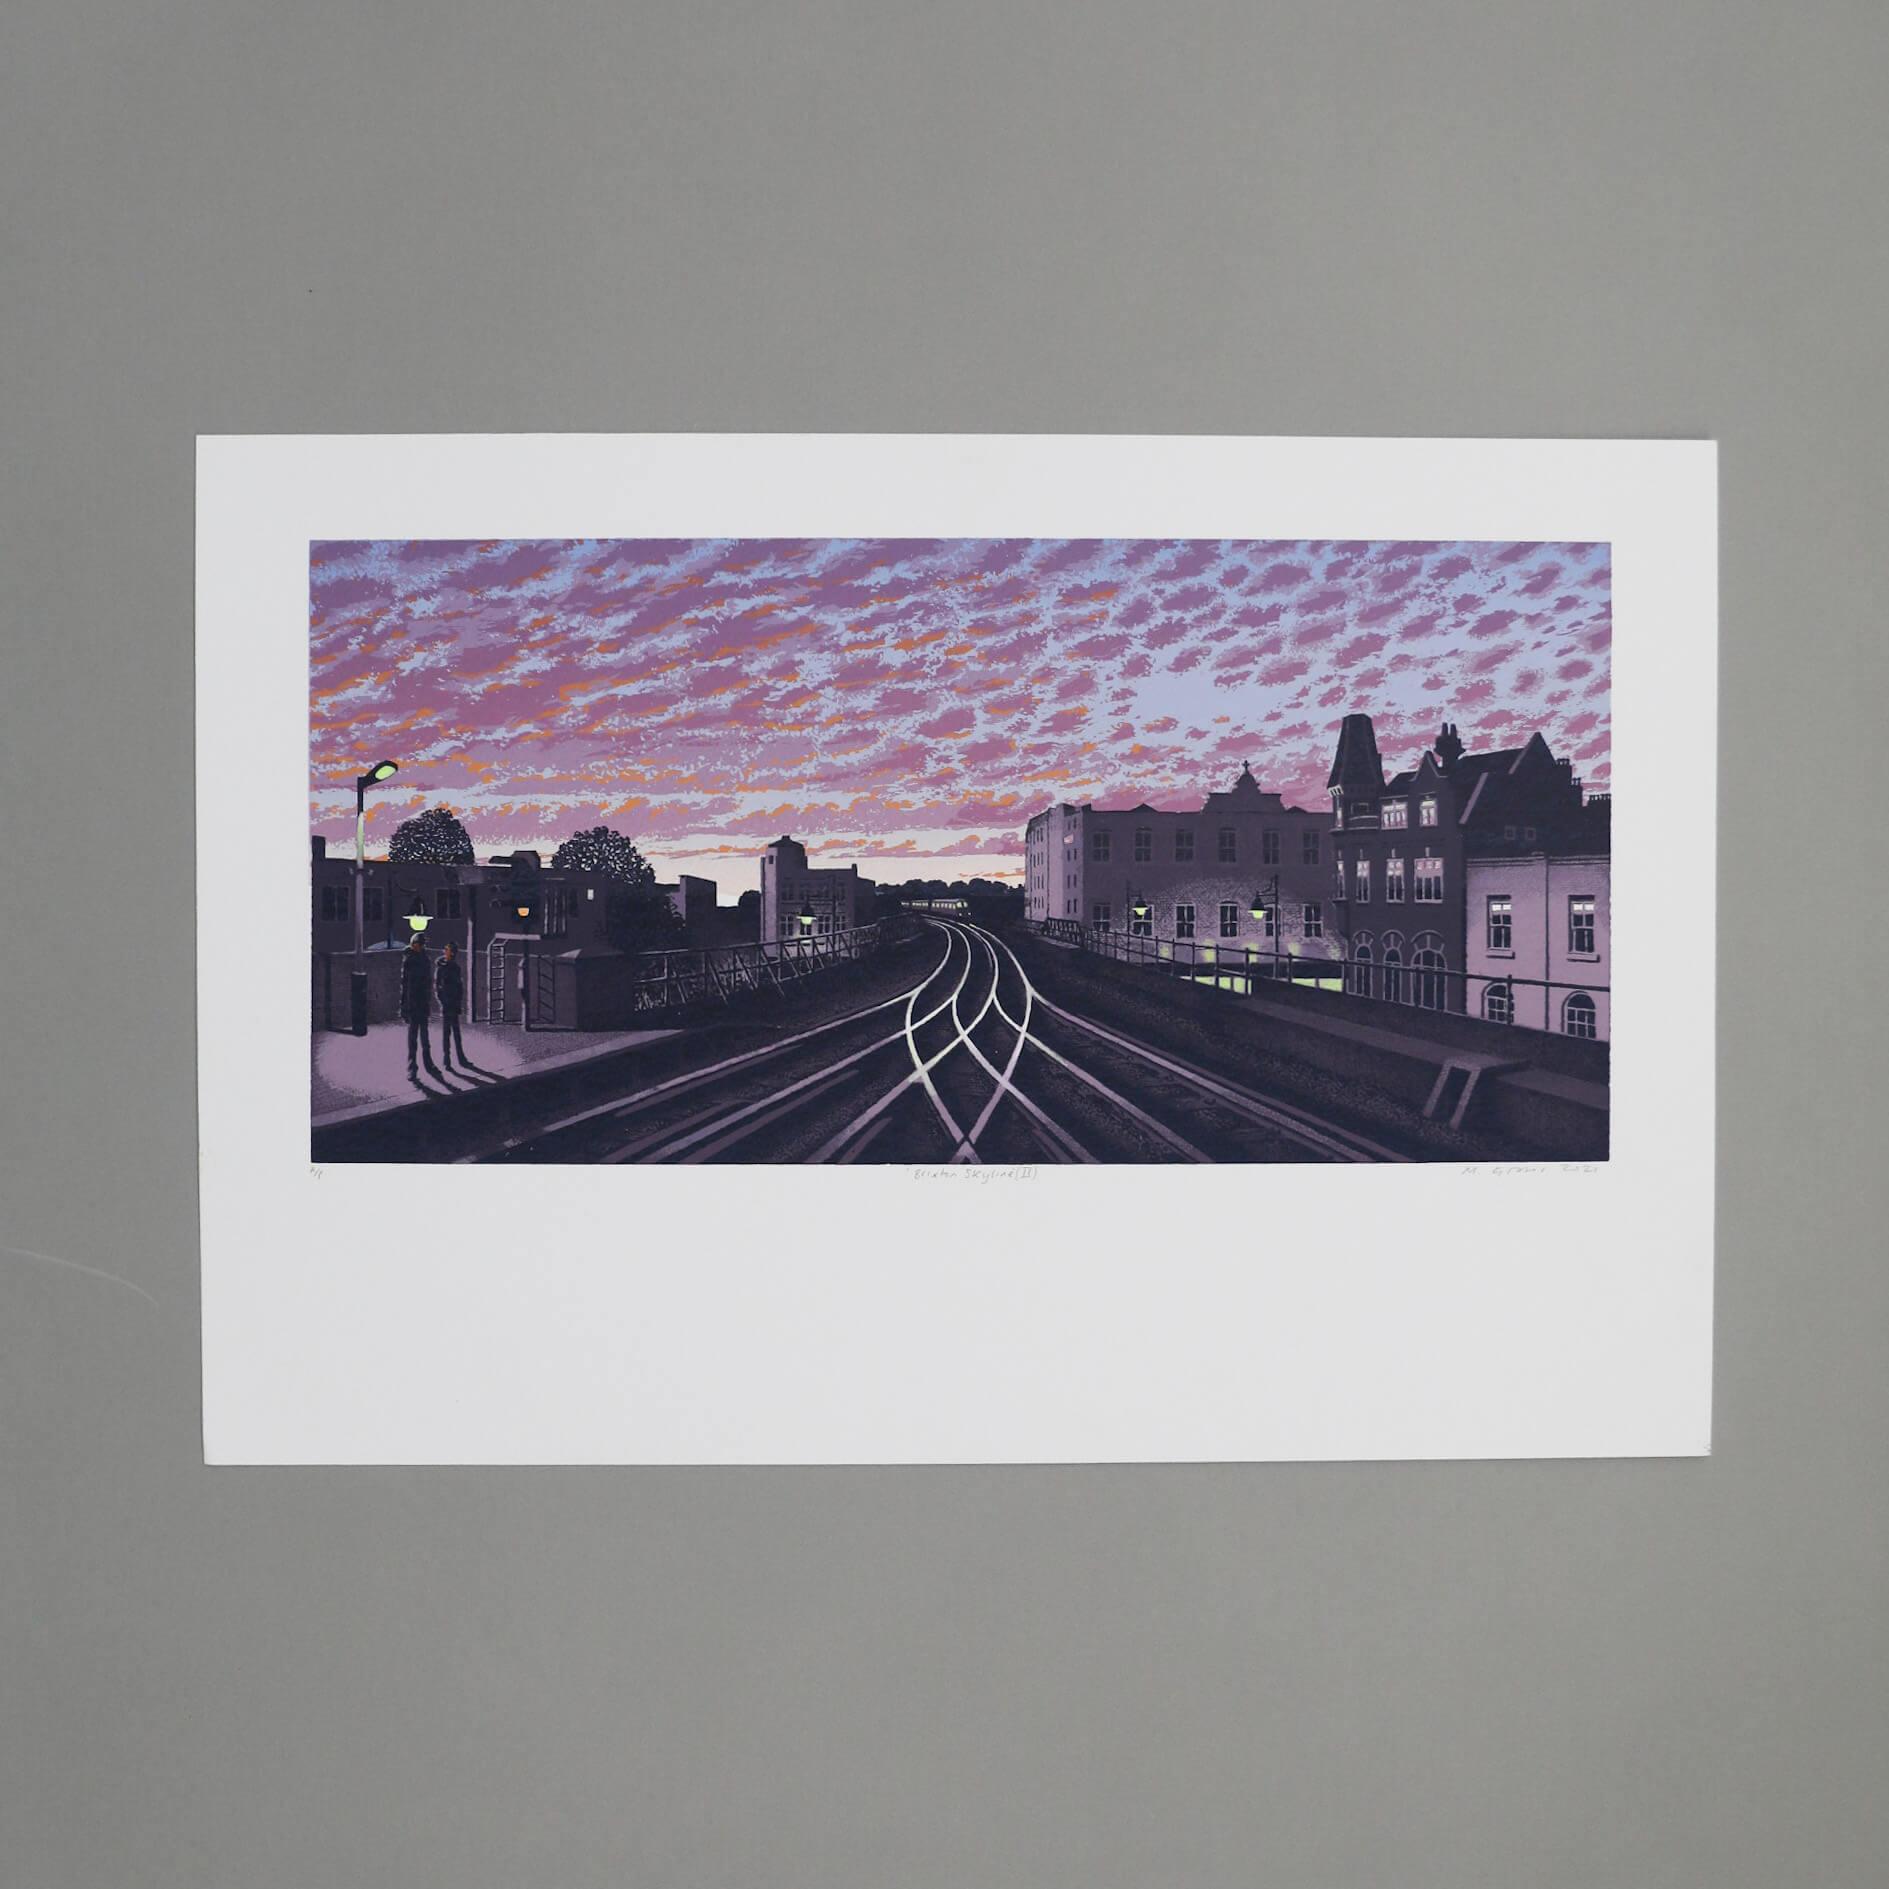 N58A0727 - Brixton Skyline II by Martin Grover